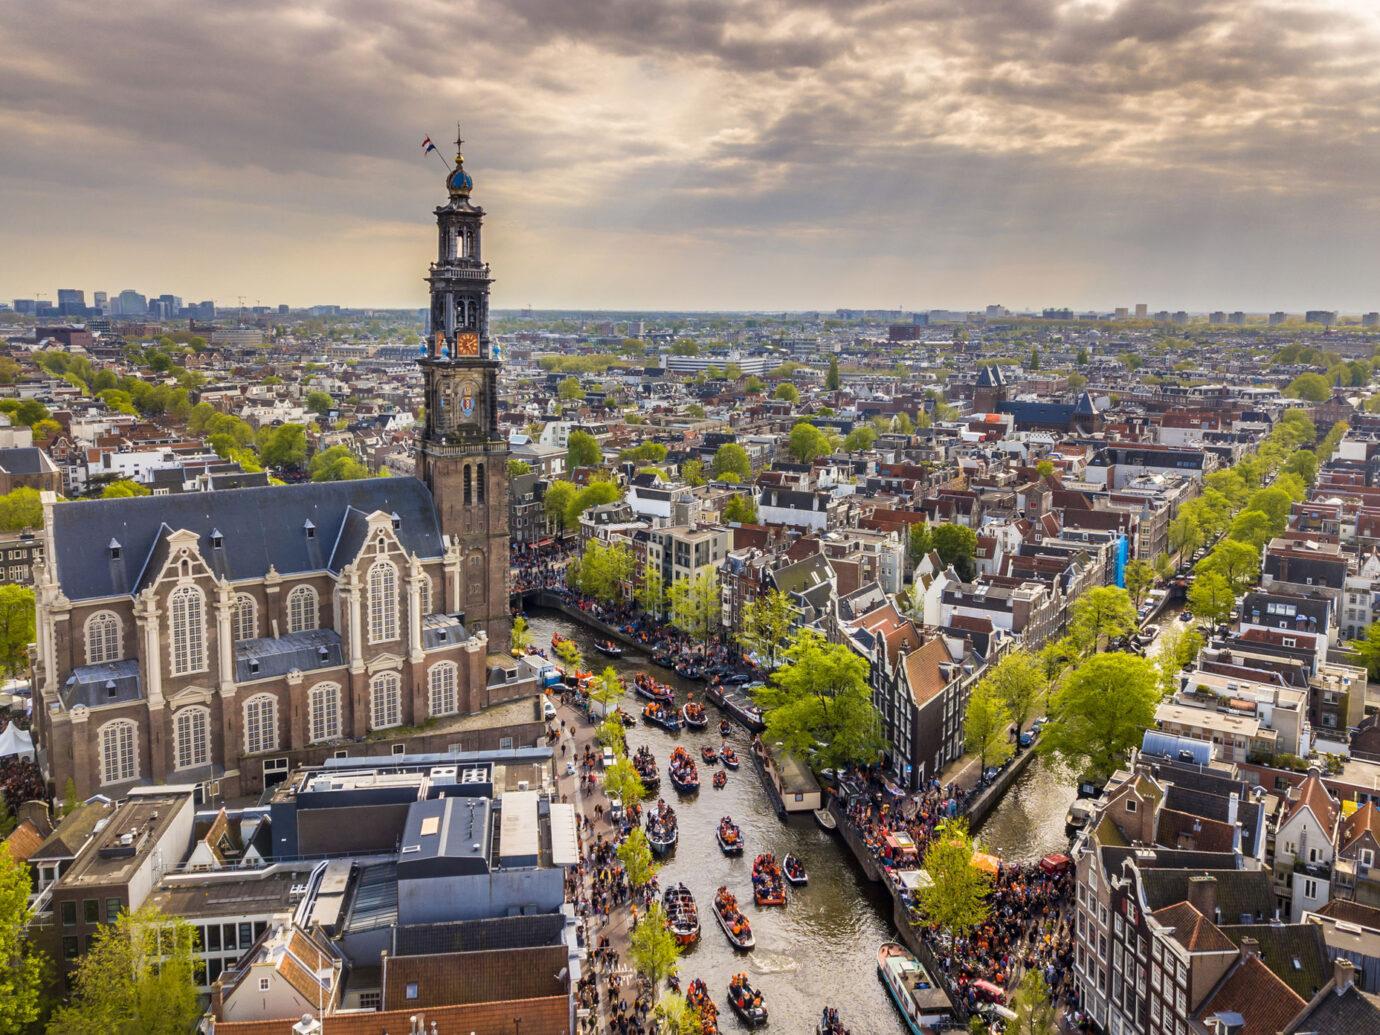 Canal Parade Amsterdam